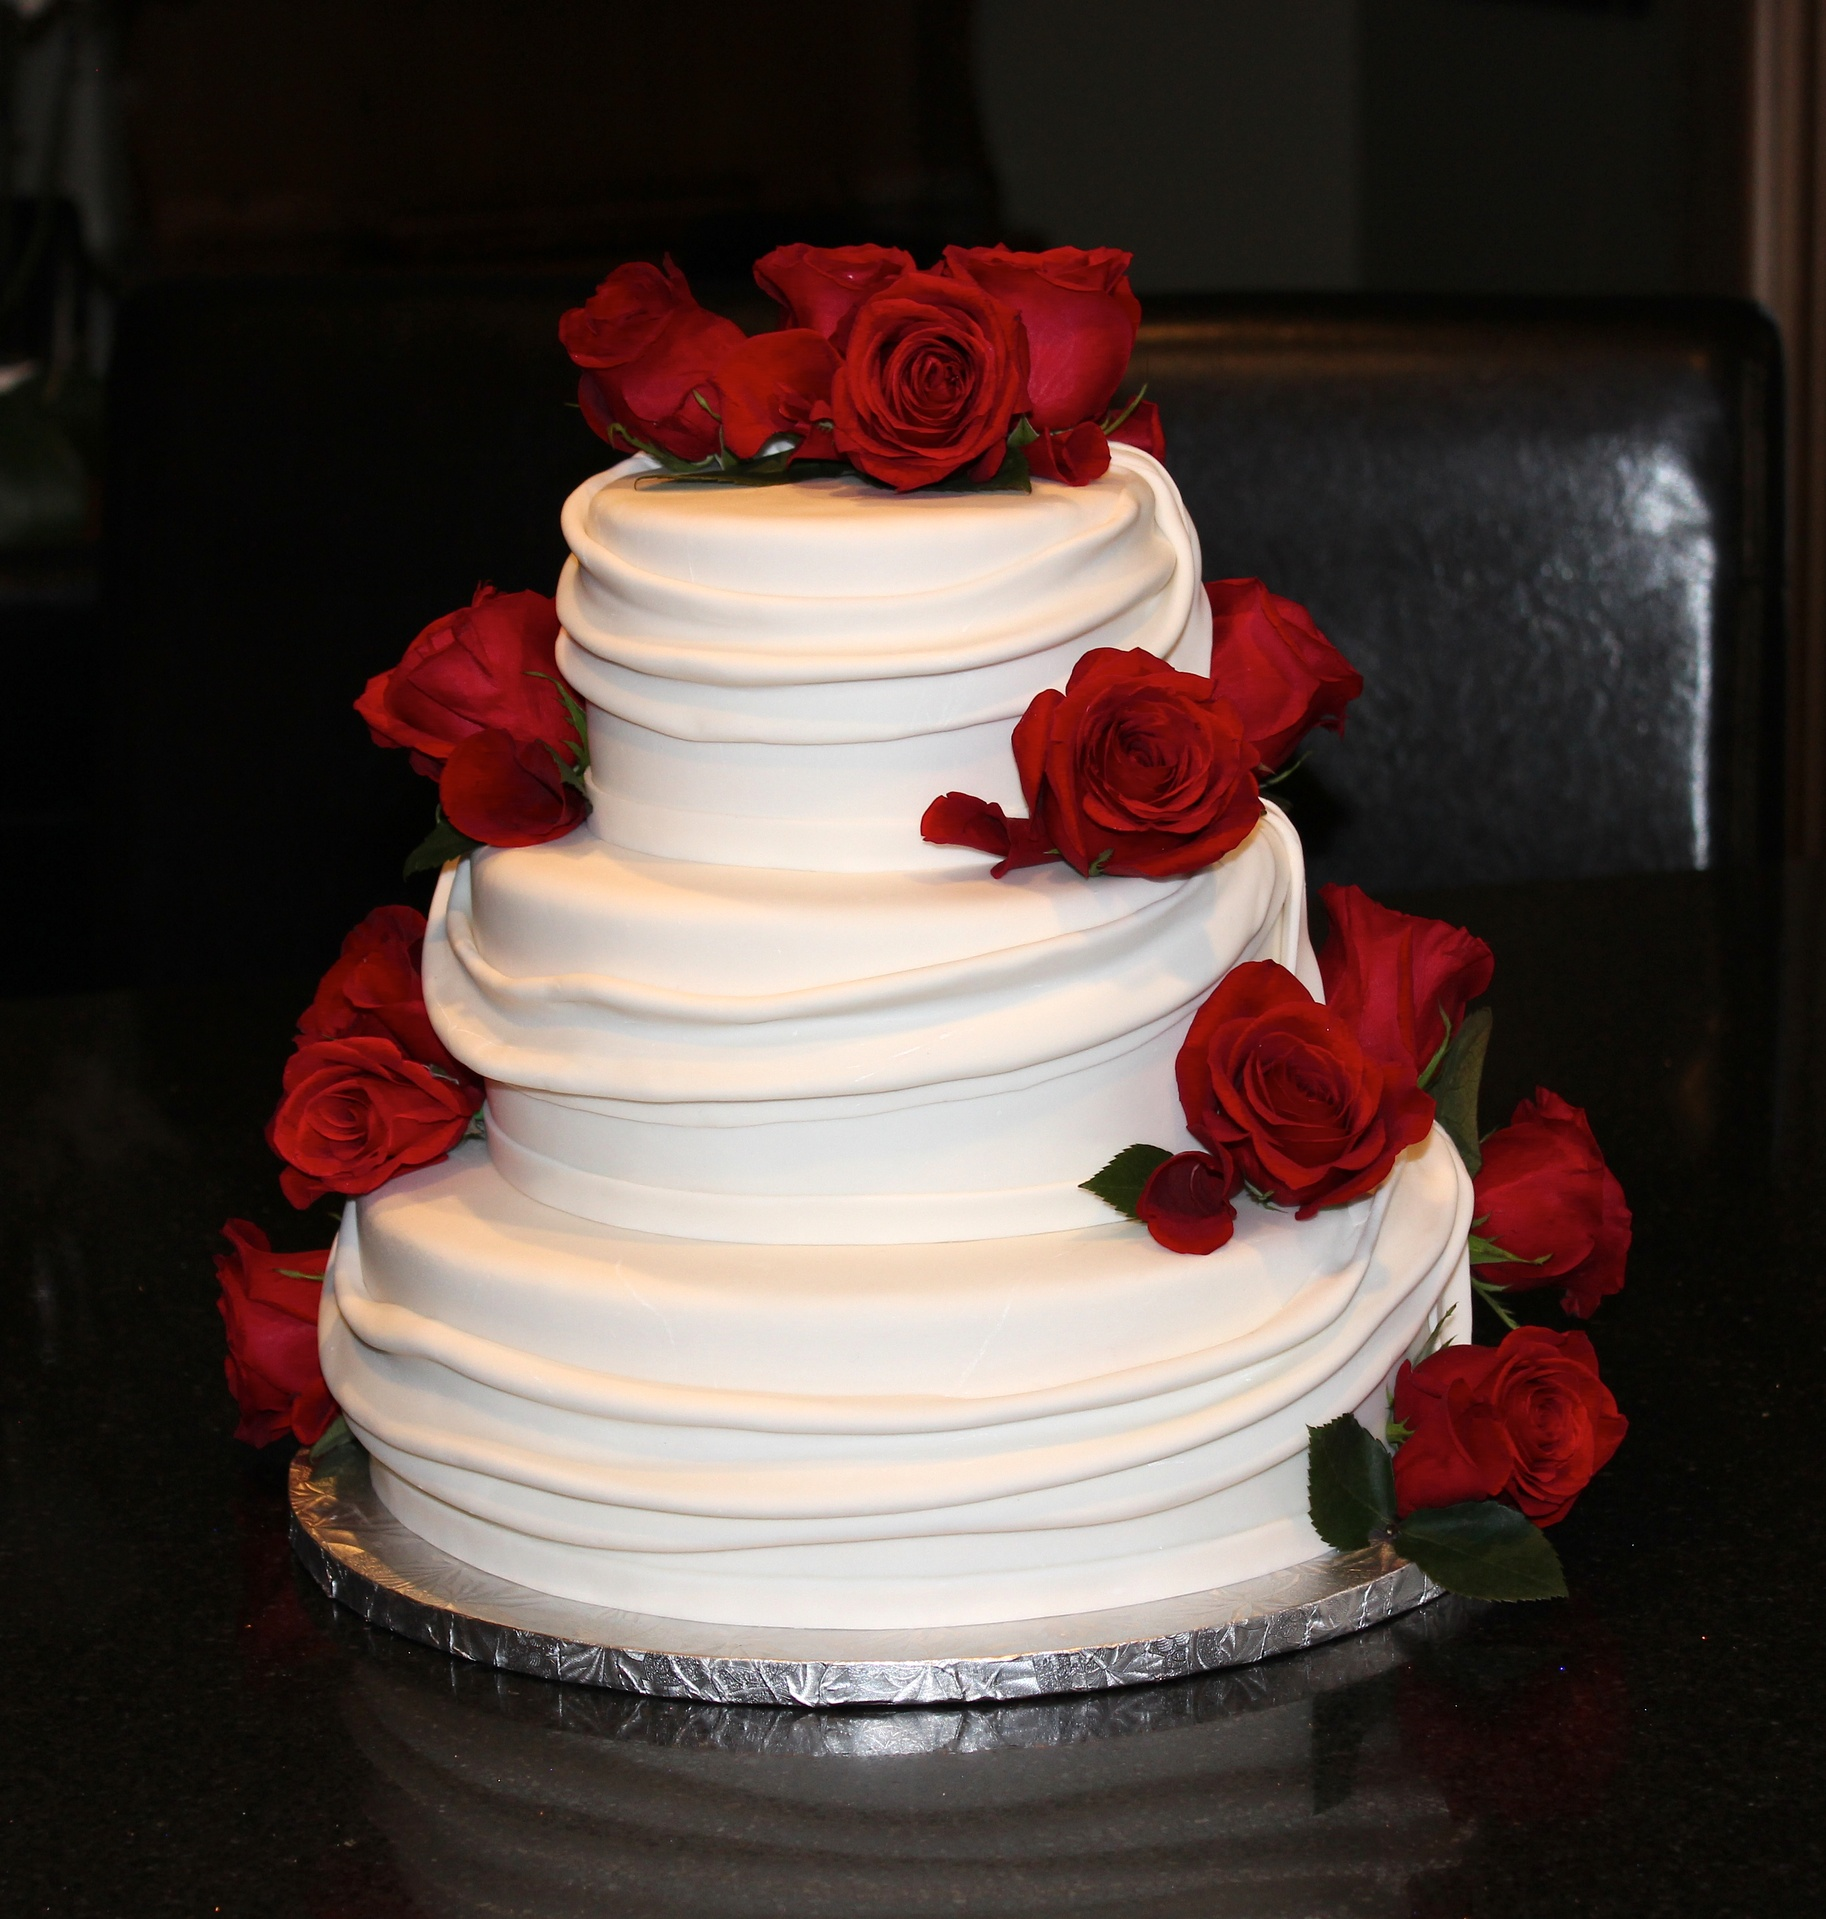 60th Birtdhday Cake